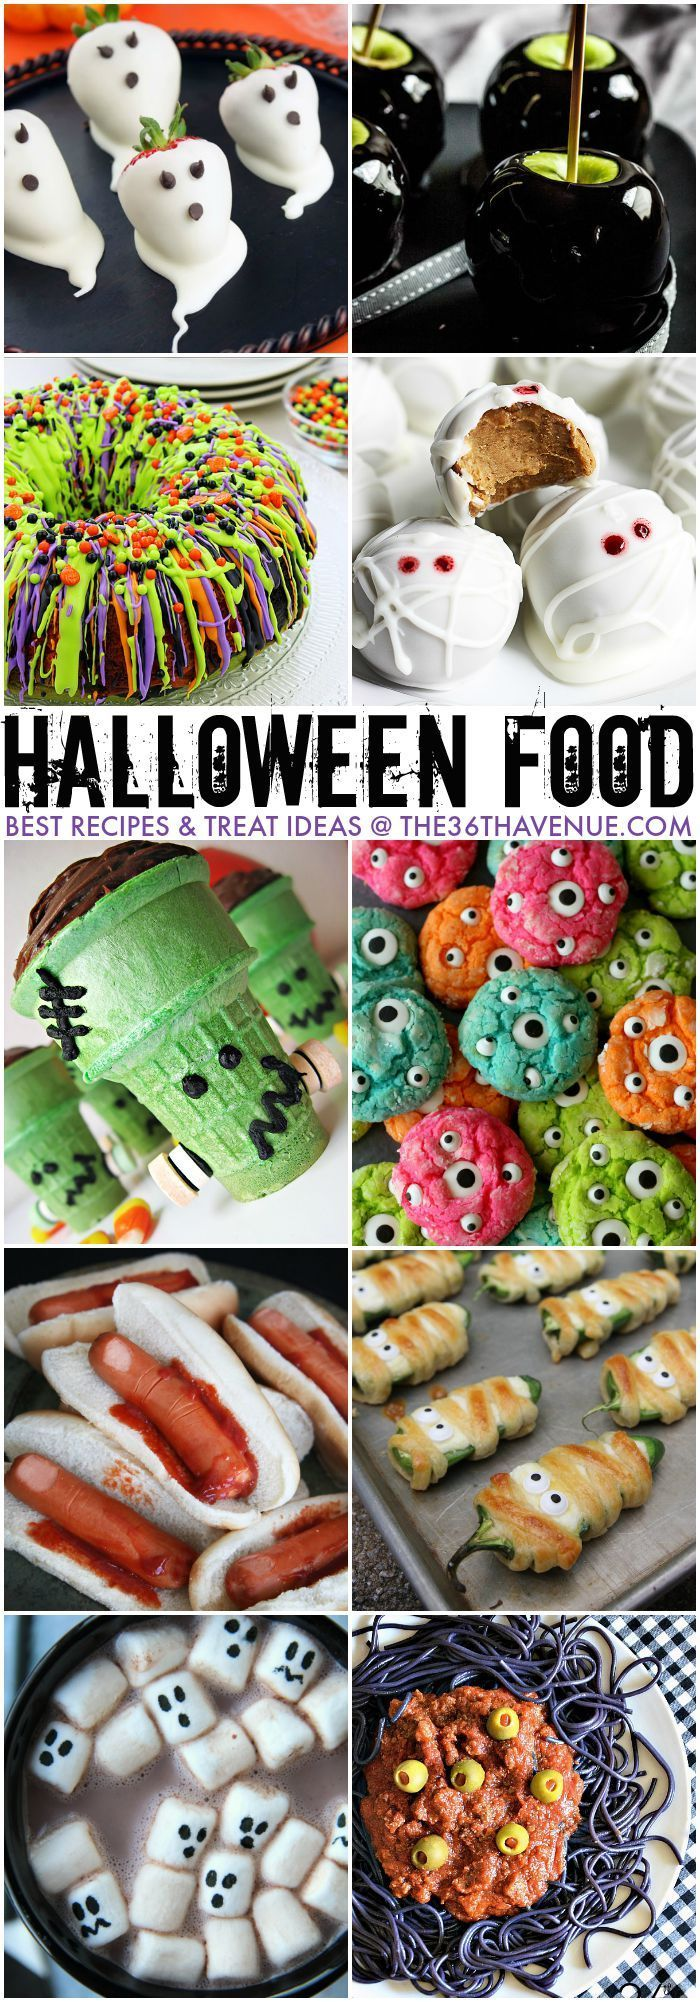 Halloween - Best Treats and Recipes | Hot chocolate mix, Creative ...